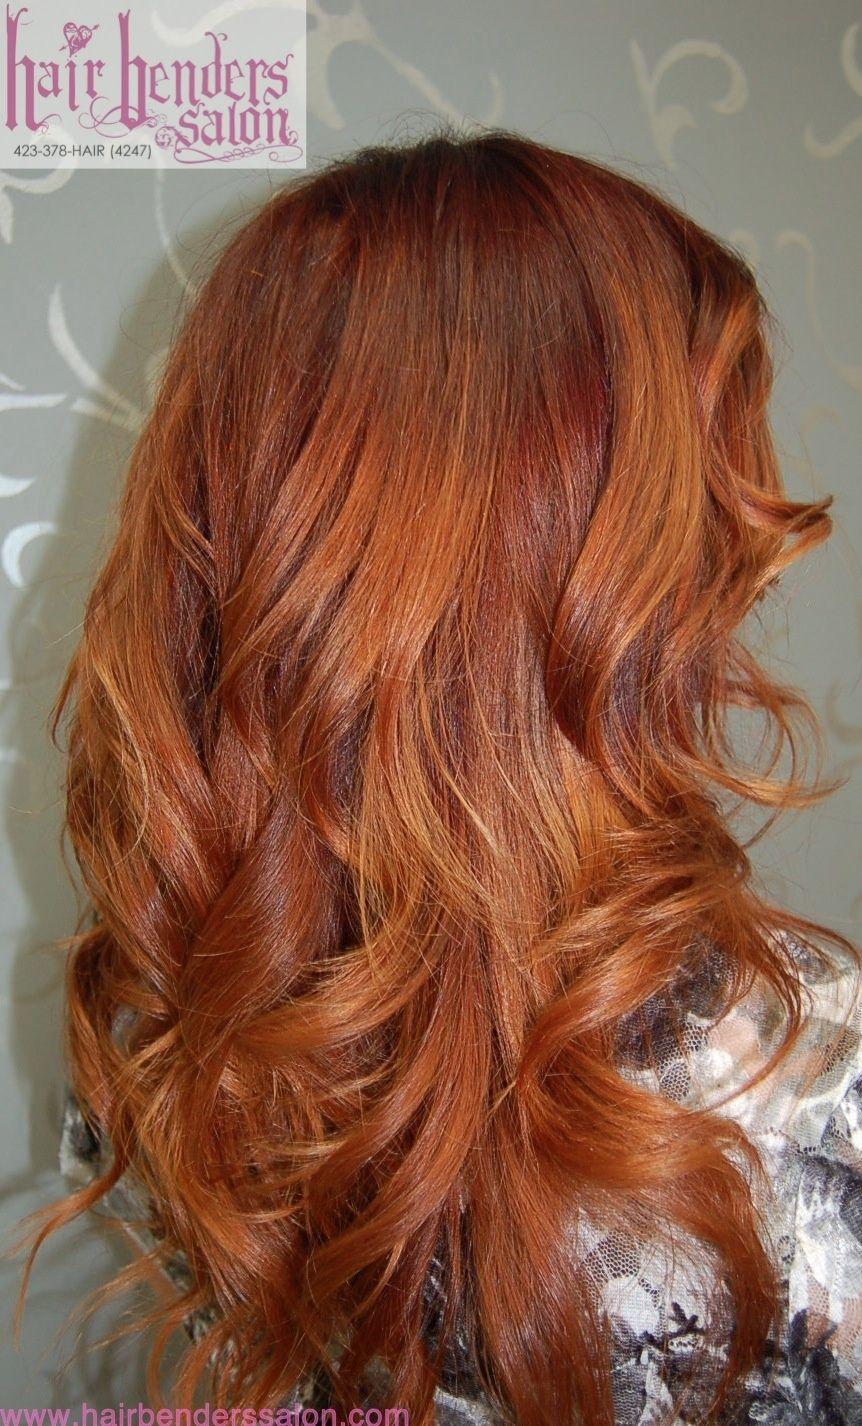 Pin By Rachael Anne On Hair Beauty Pinterest Red Hair Hair